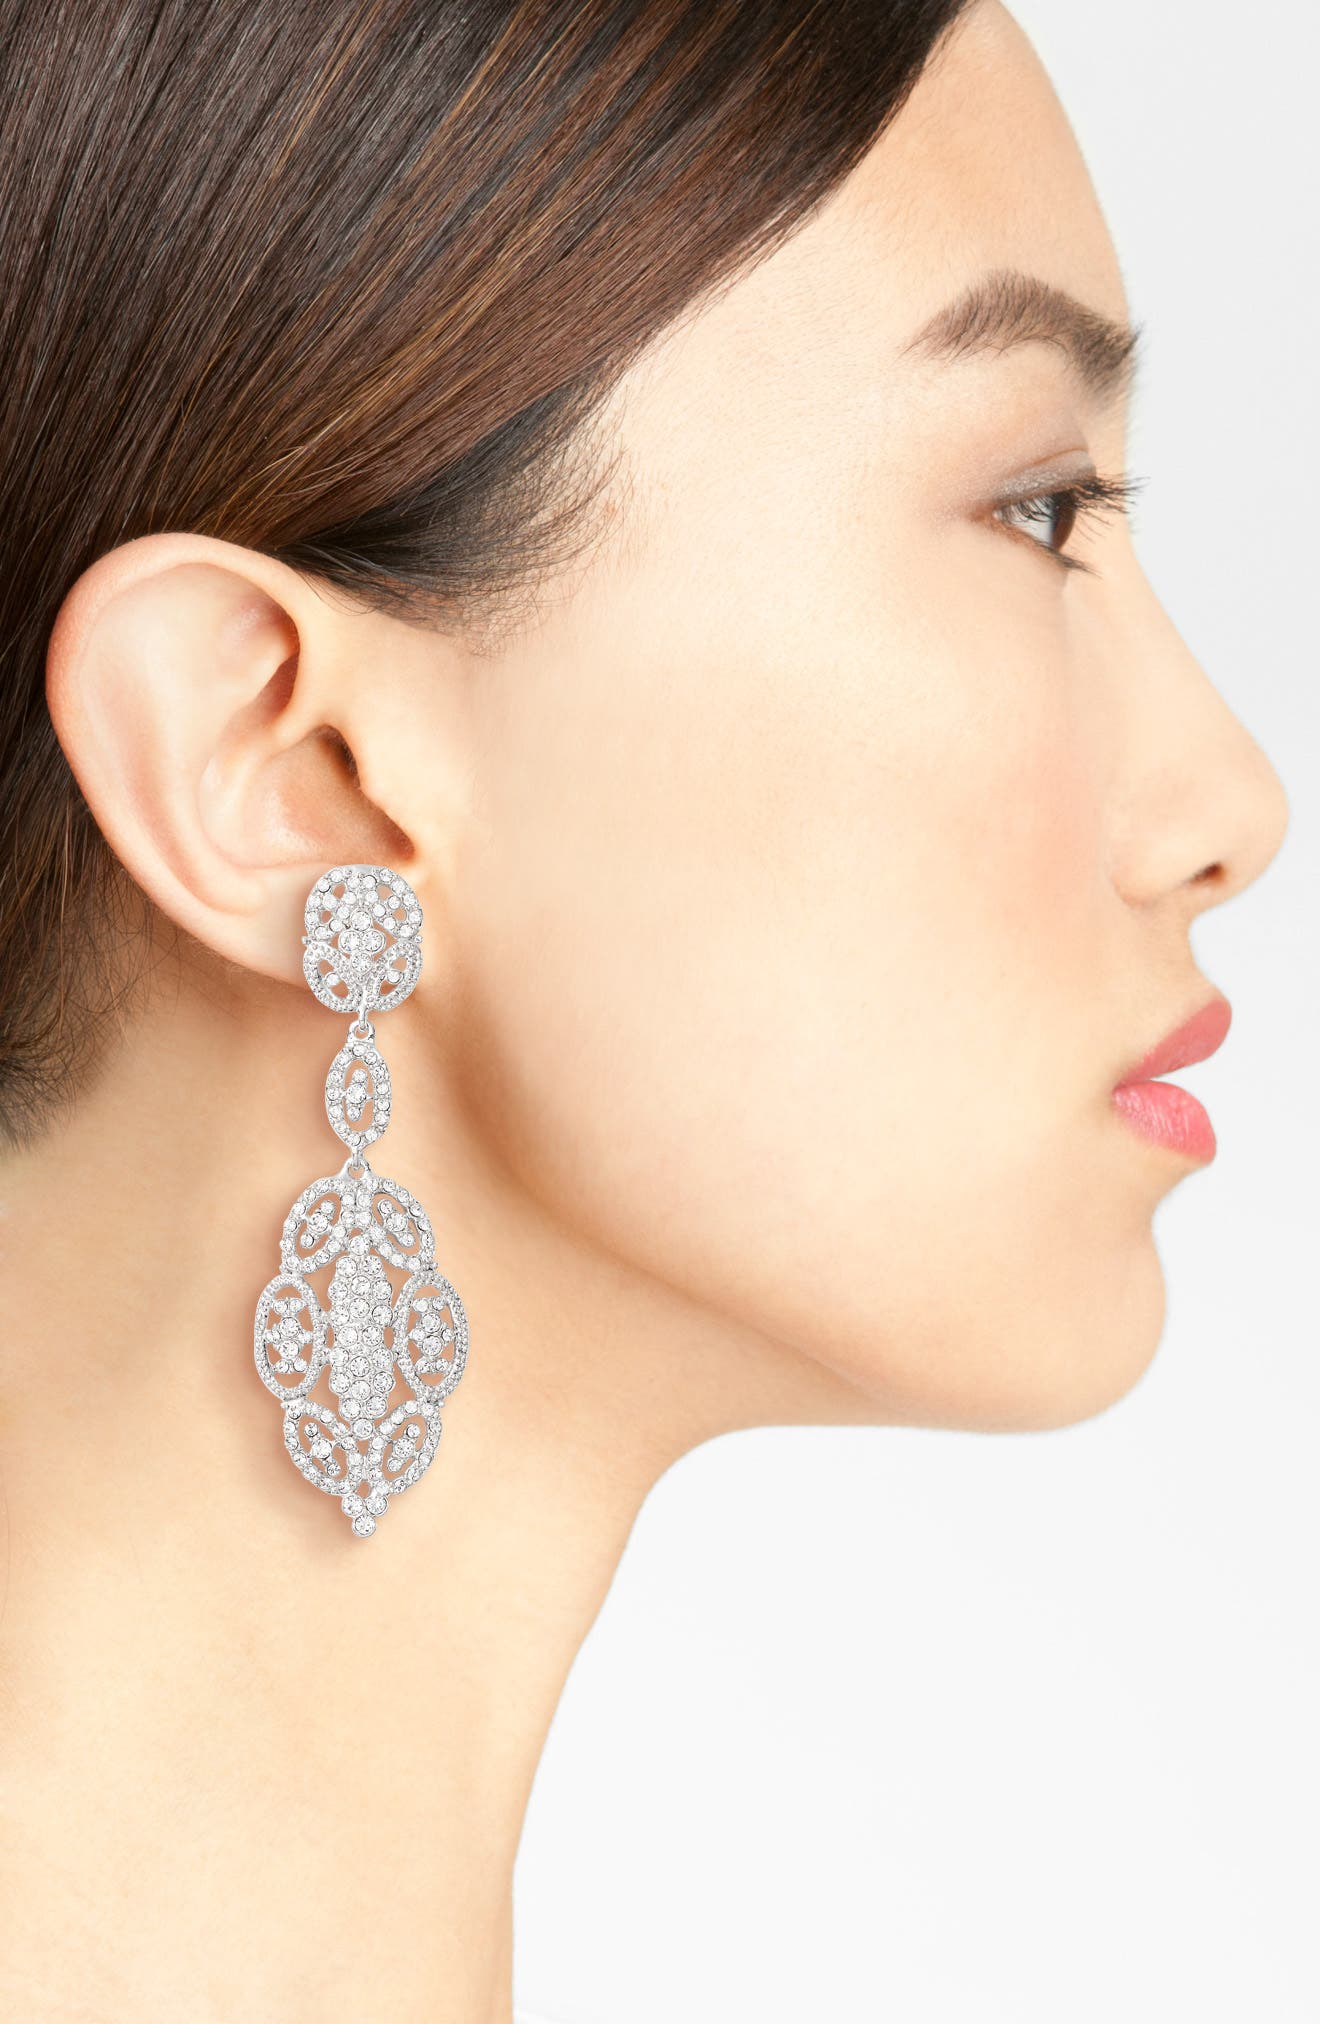 Glamorous Swarovski Crystal Drop Earrings,                             Alternate thumbnail 2, color,                             040